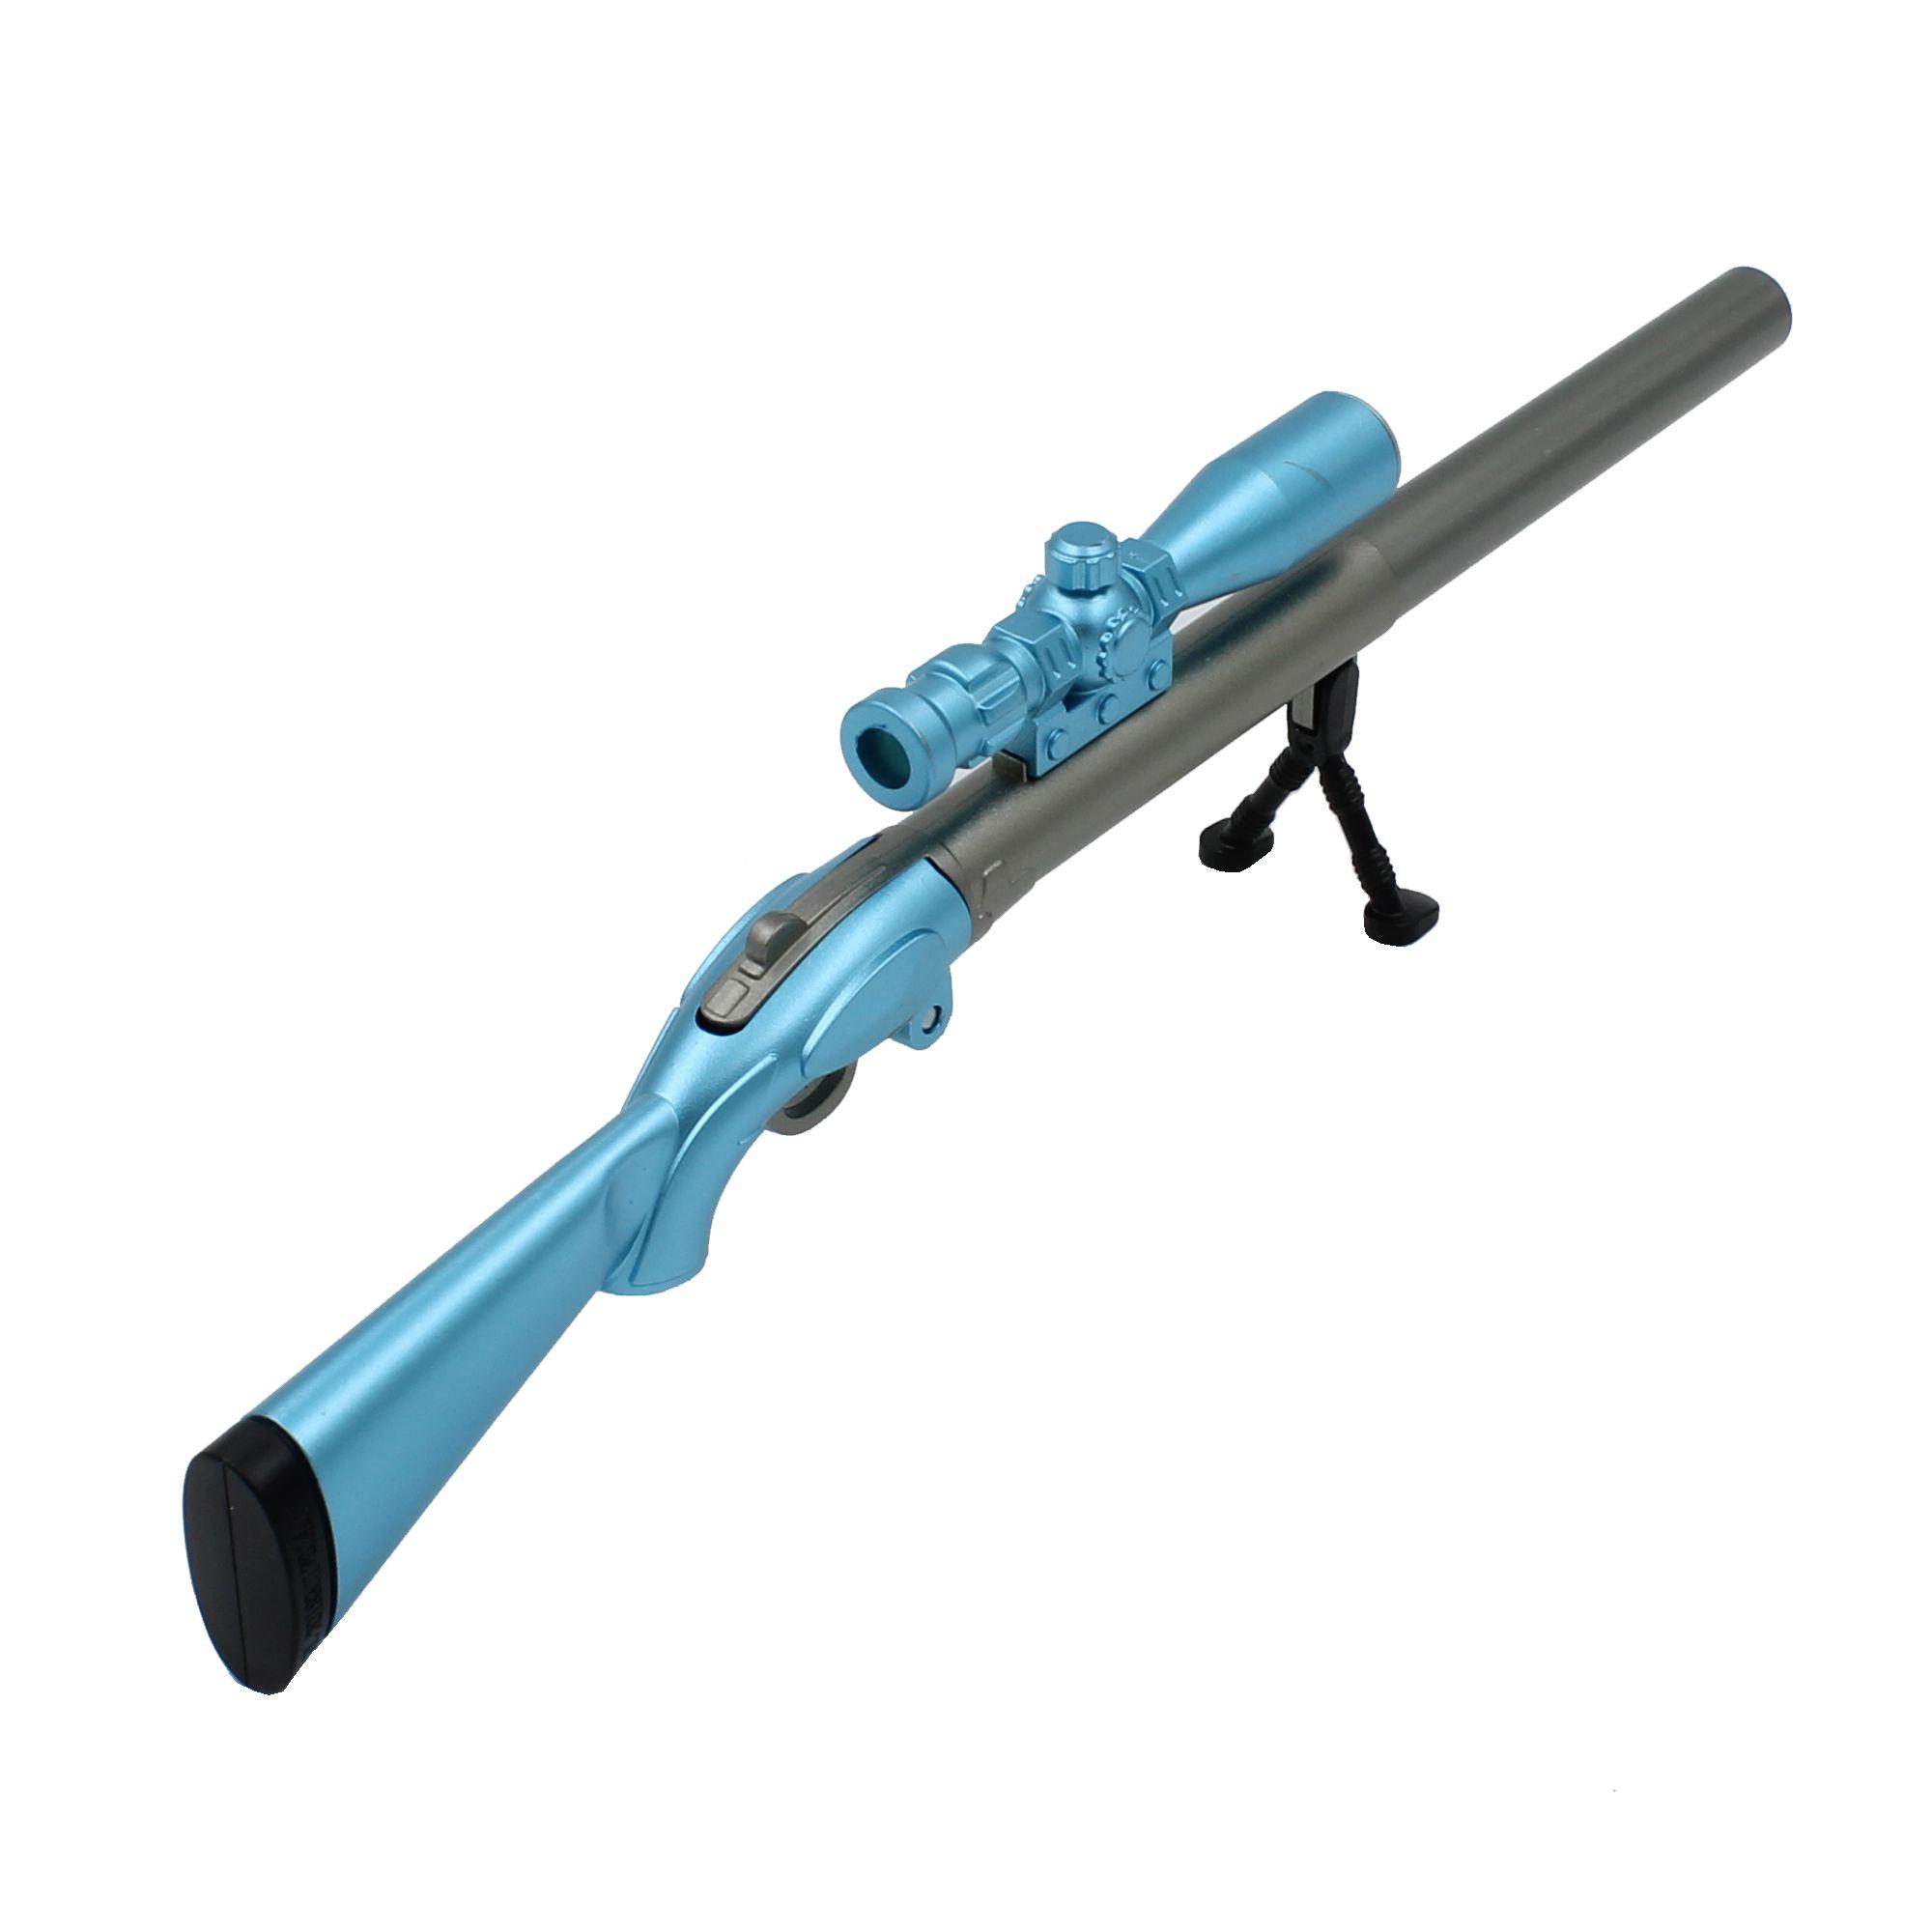 Pix funny pusca luneta led bleu